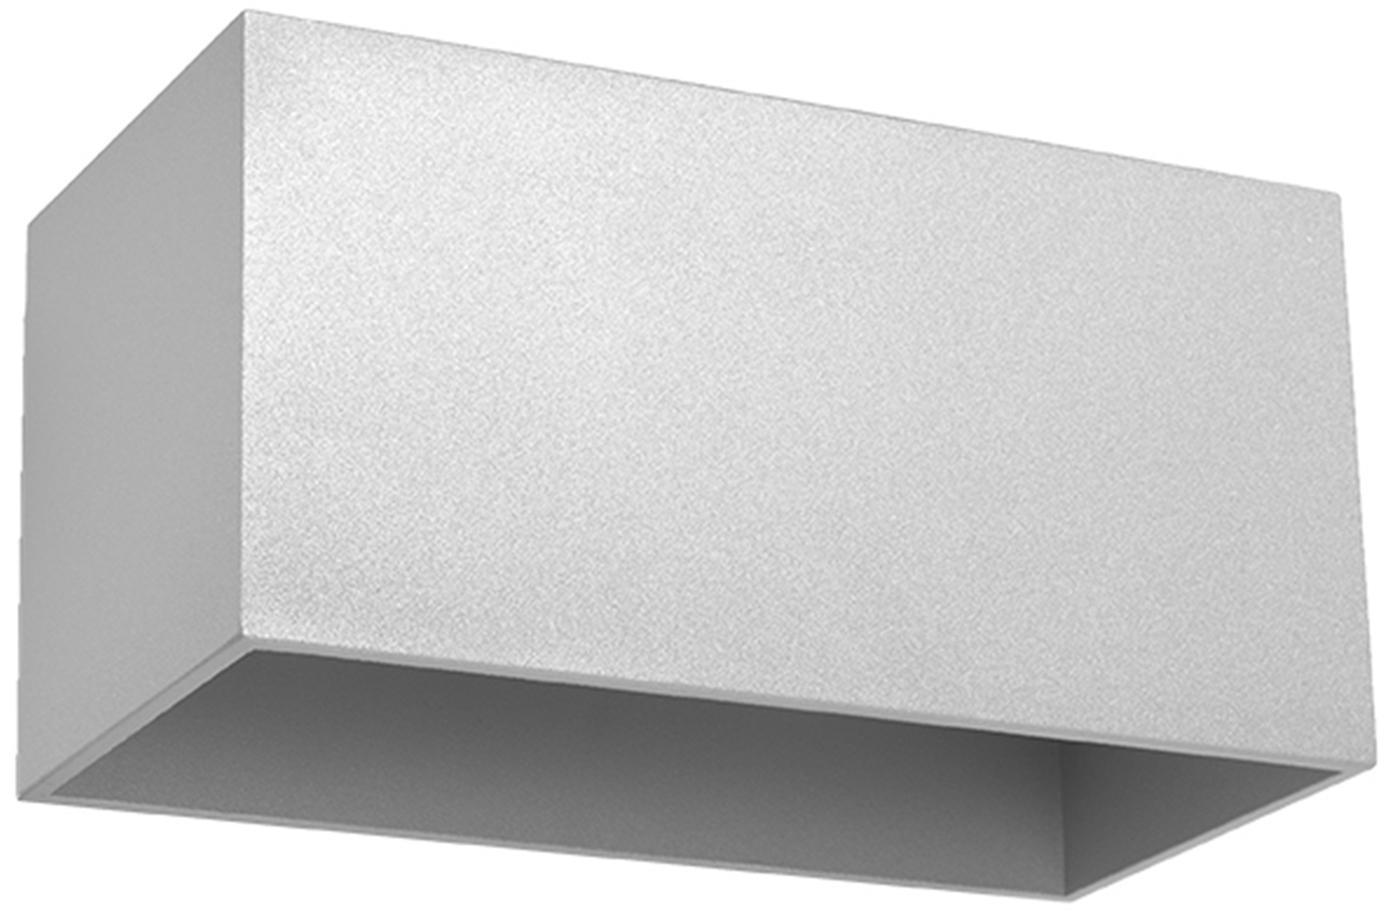 Kinkiet Geo Maxi, Aluminium, Szary, 20 x 10 cm